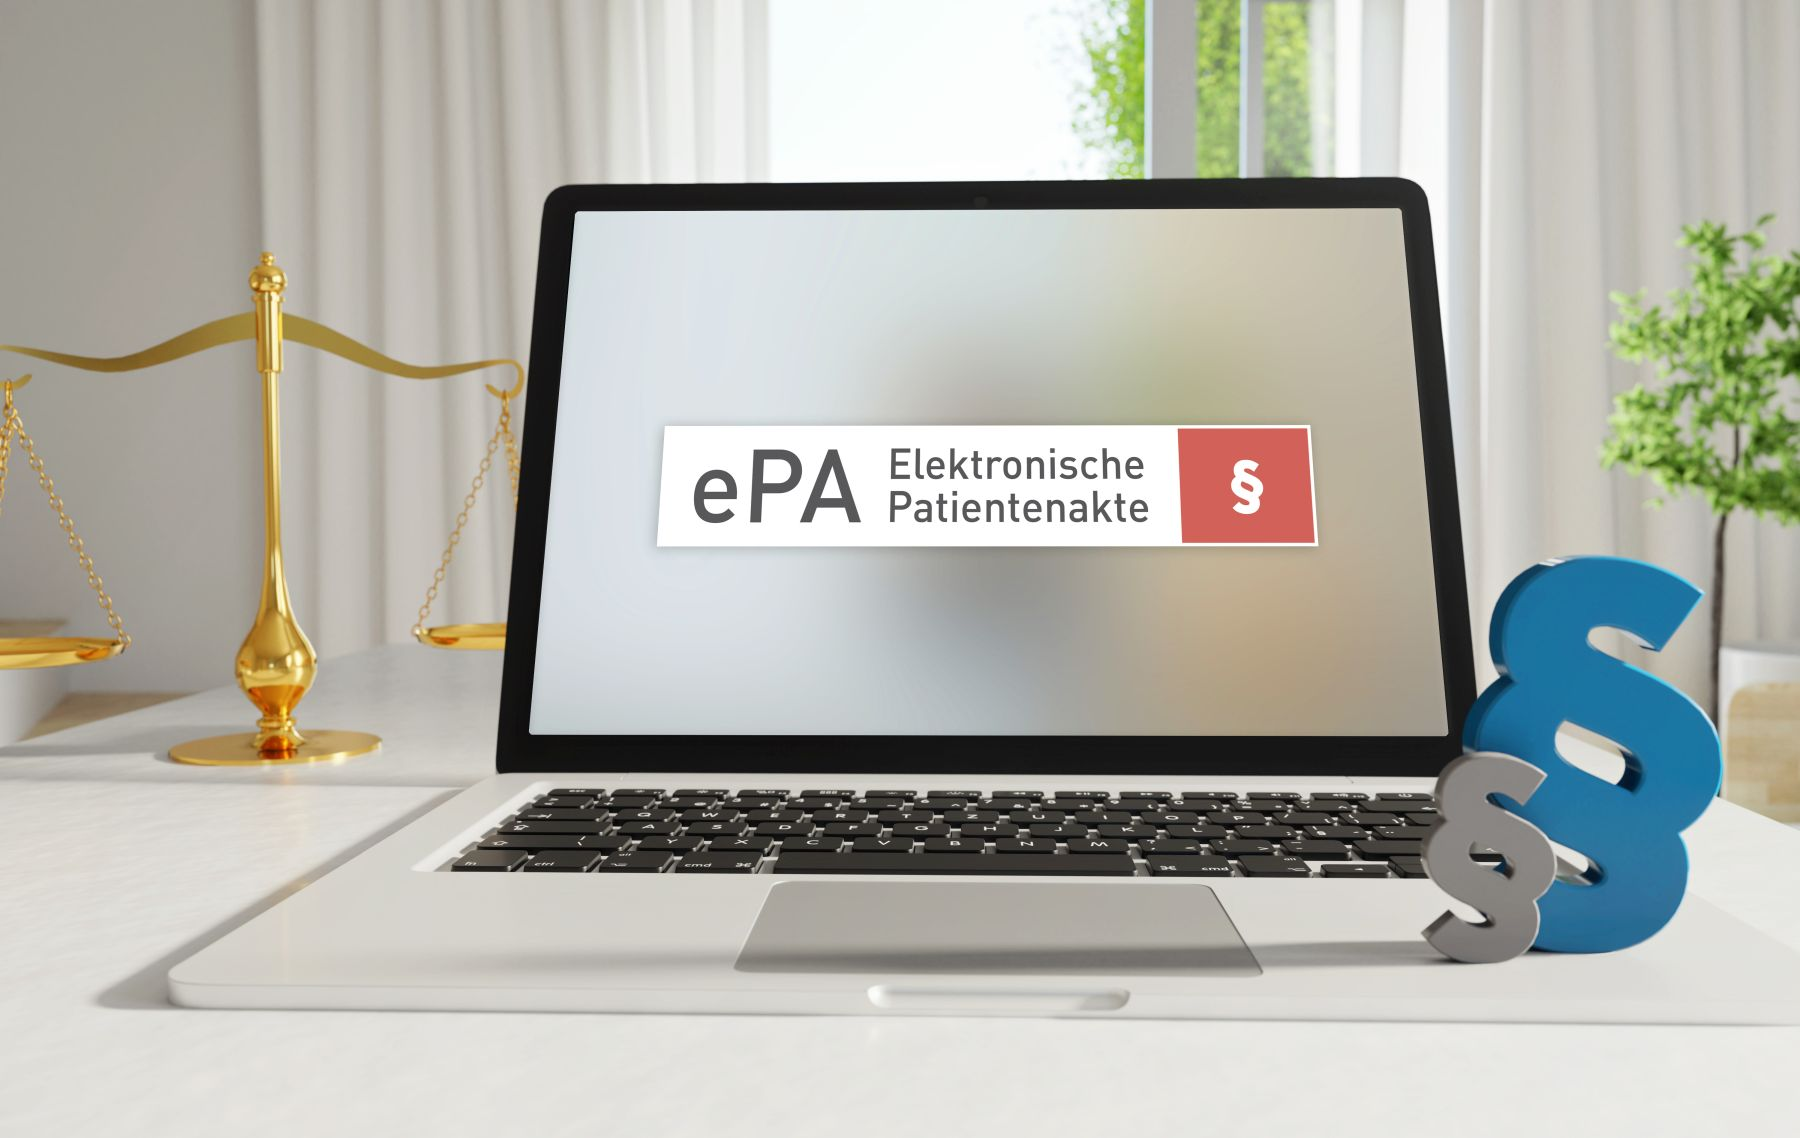 Laptop mit ePA